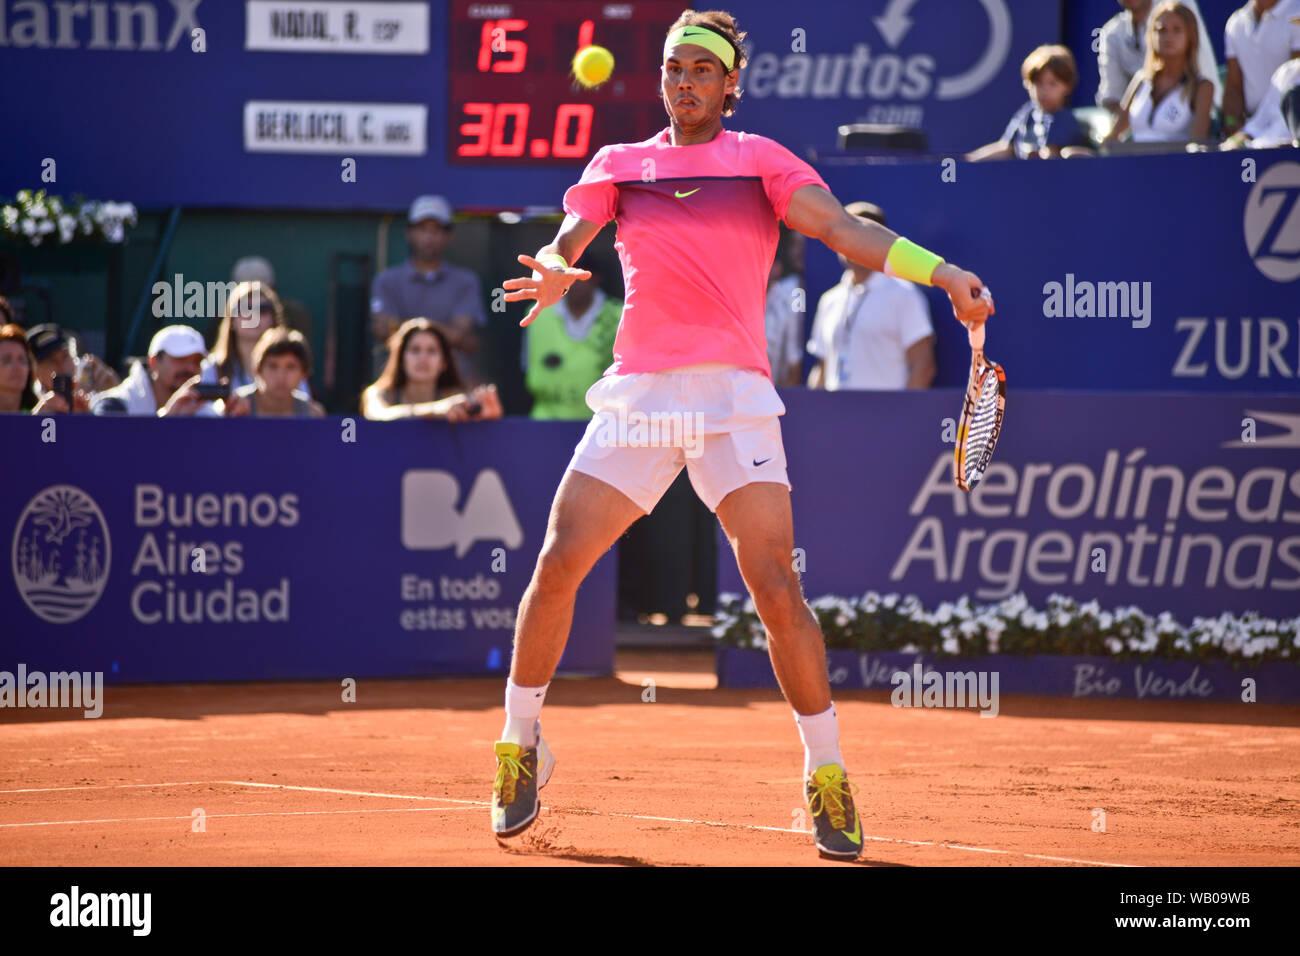 Rafael Nadal Forehand Shot Stock Photo Alamy